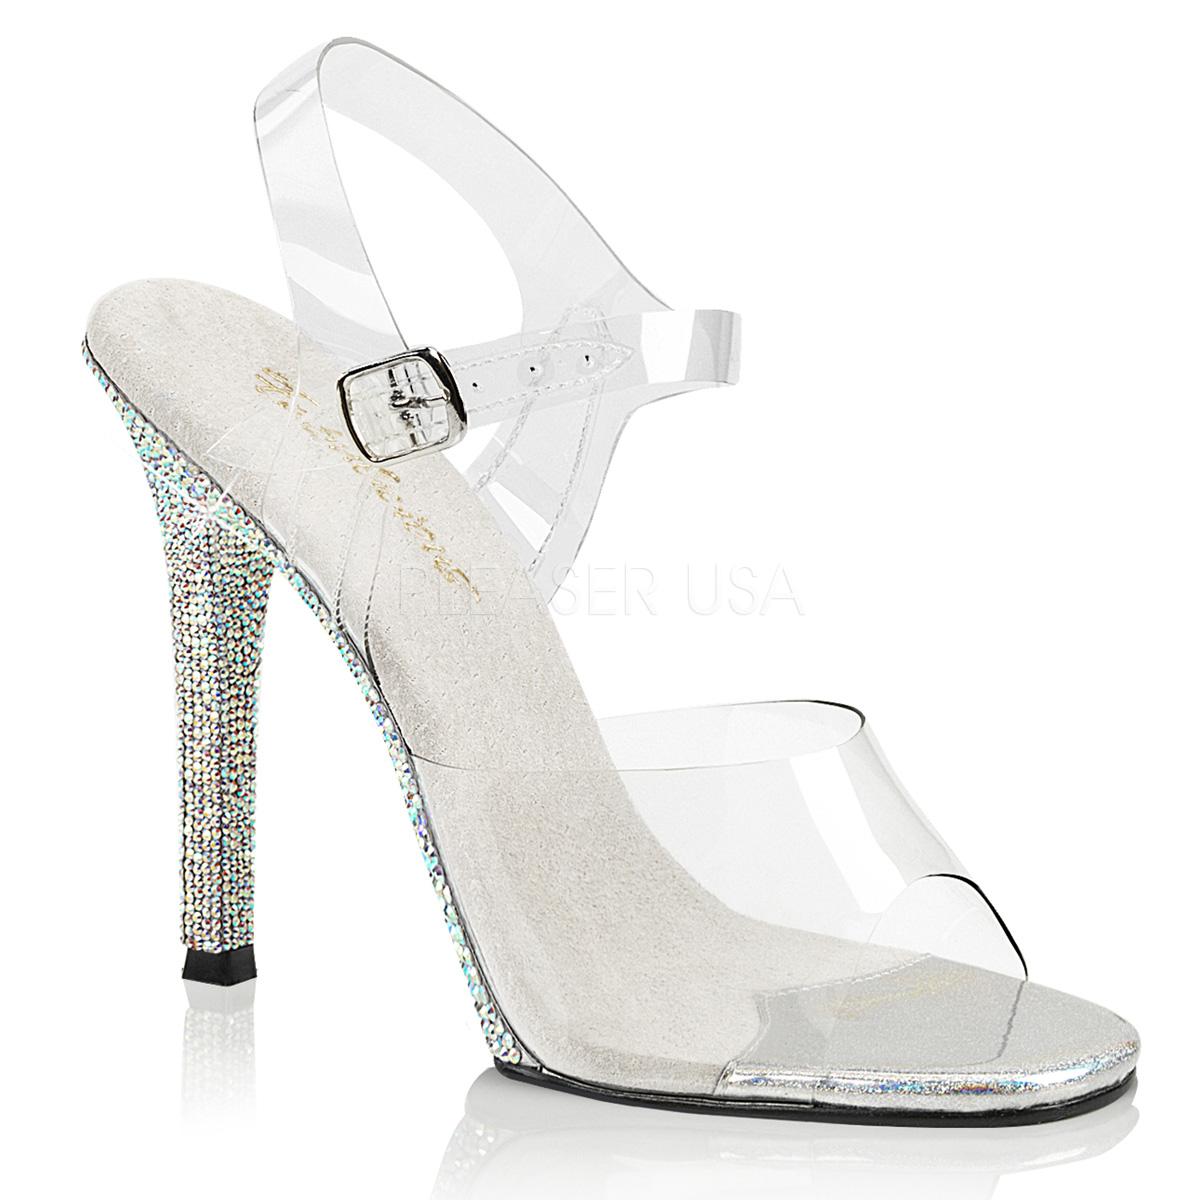 Sandales transparentes talon strass - Pointure : 39